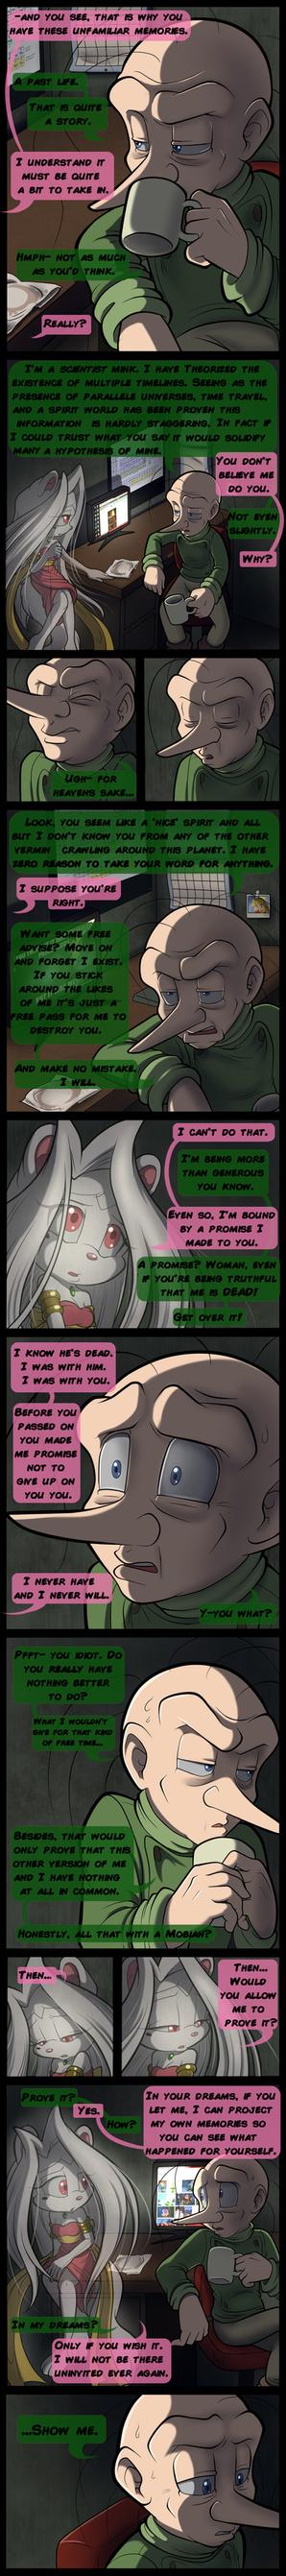 Resurgence Page 1 by KissTheThunder